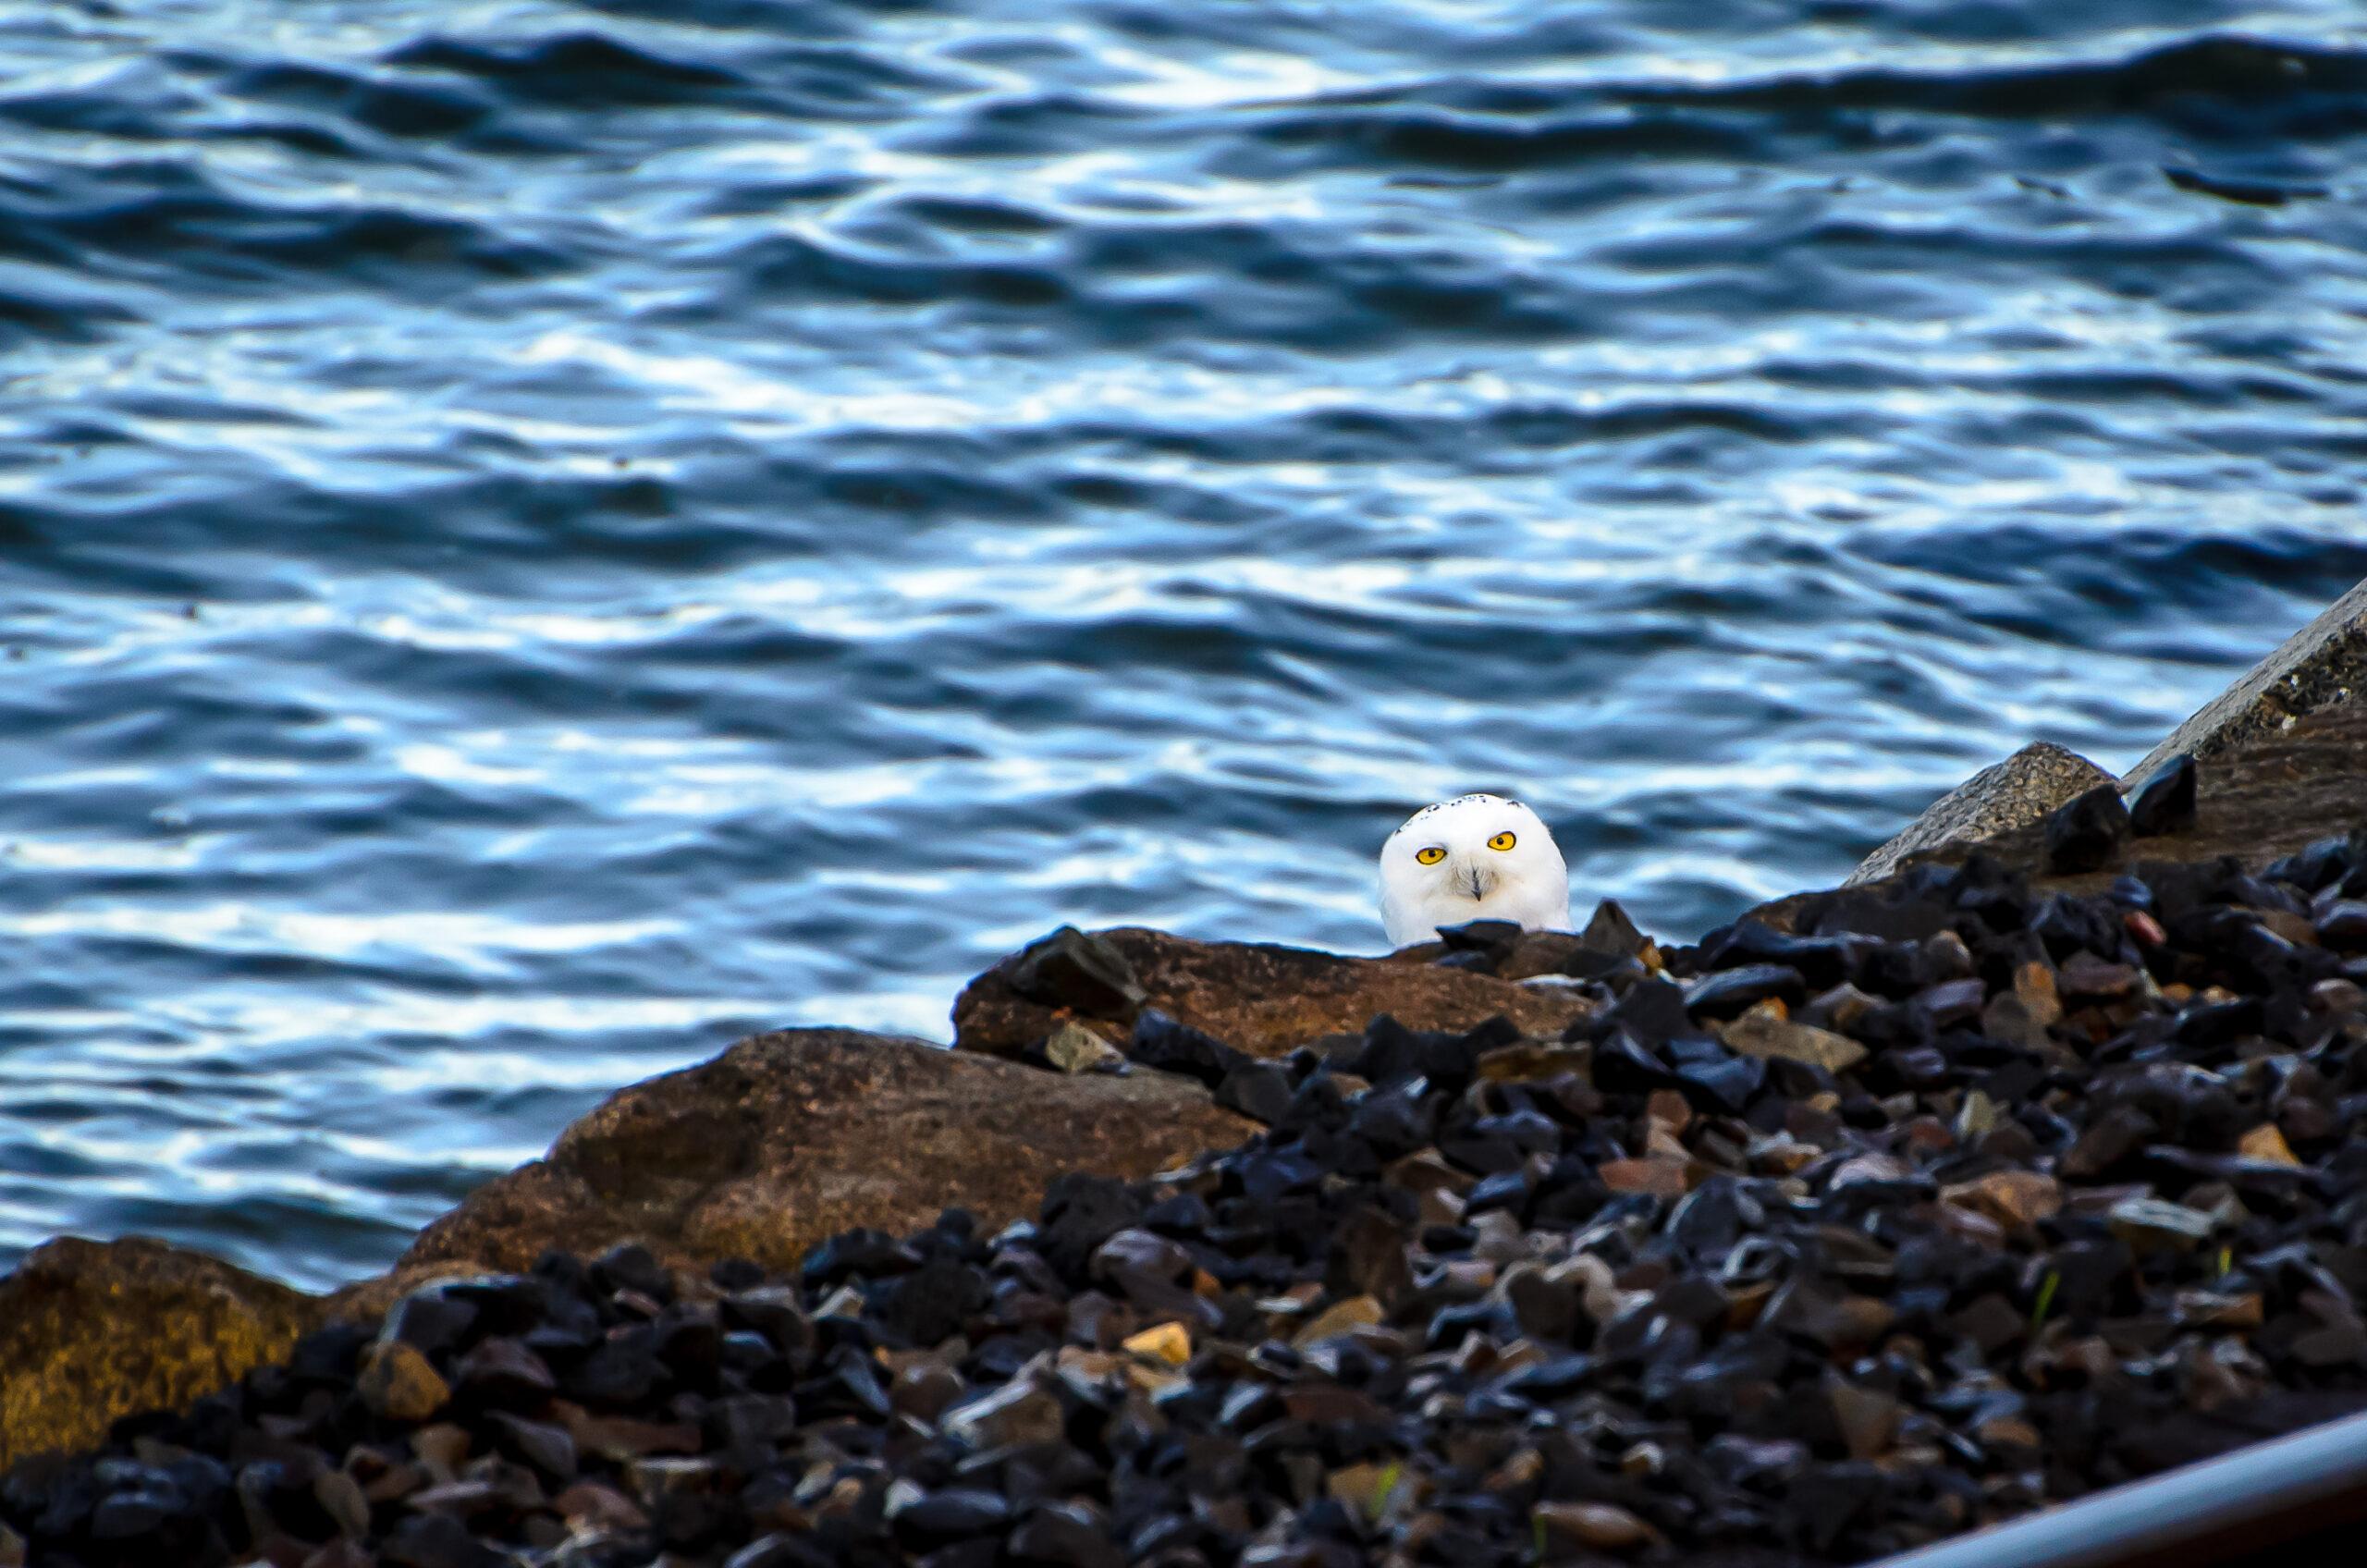 Snowy Owl Story and Photos